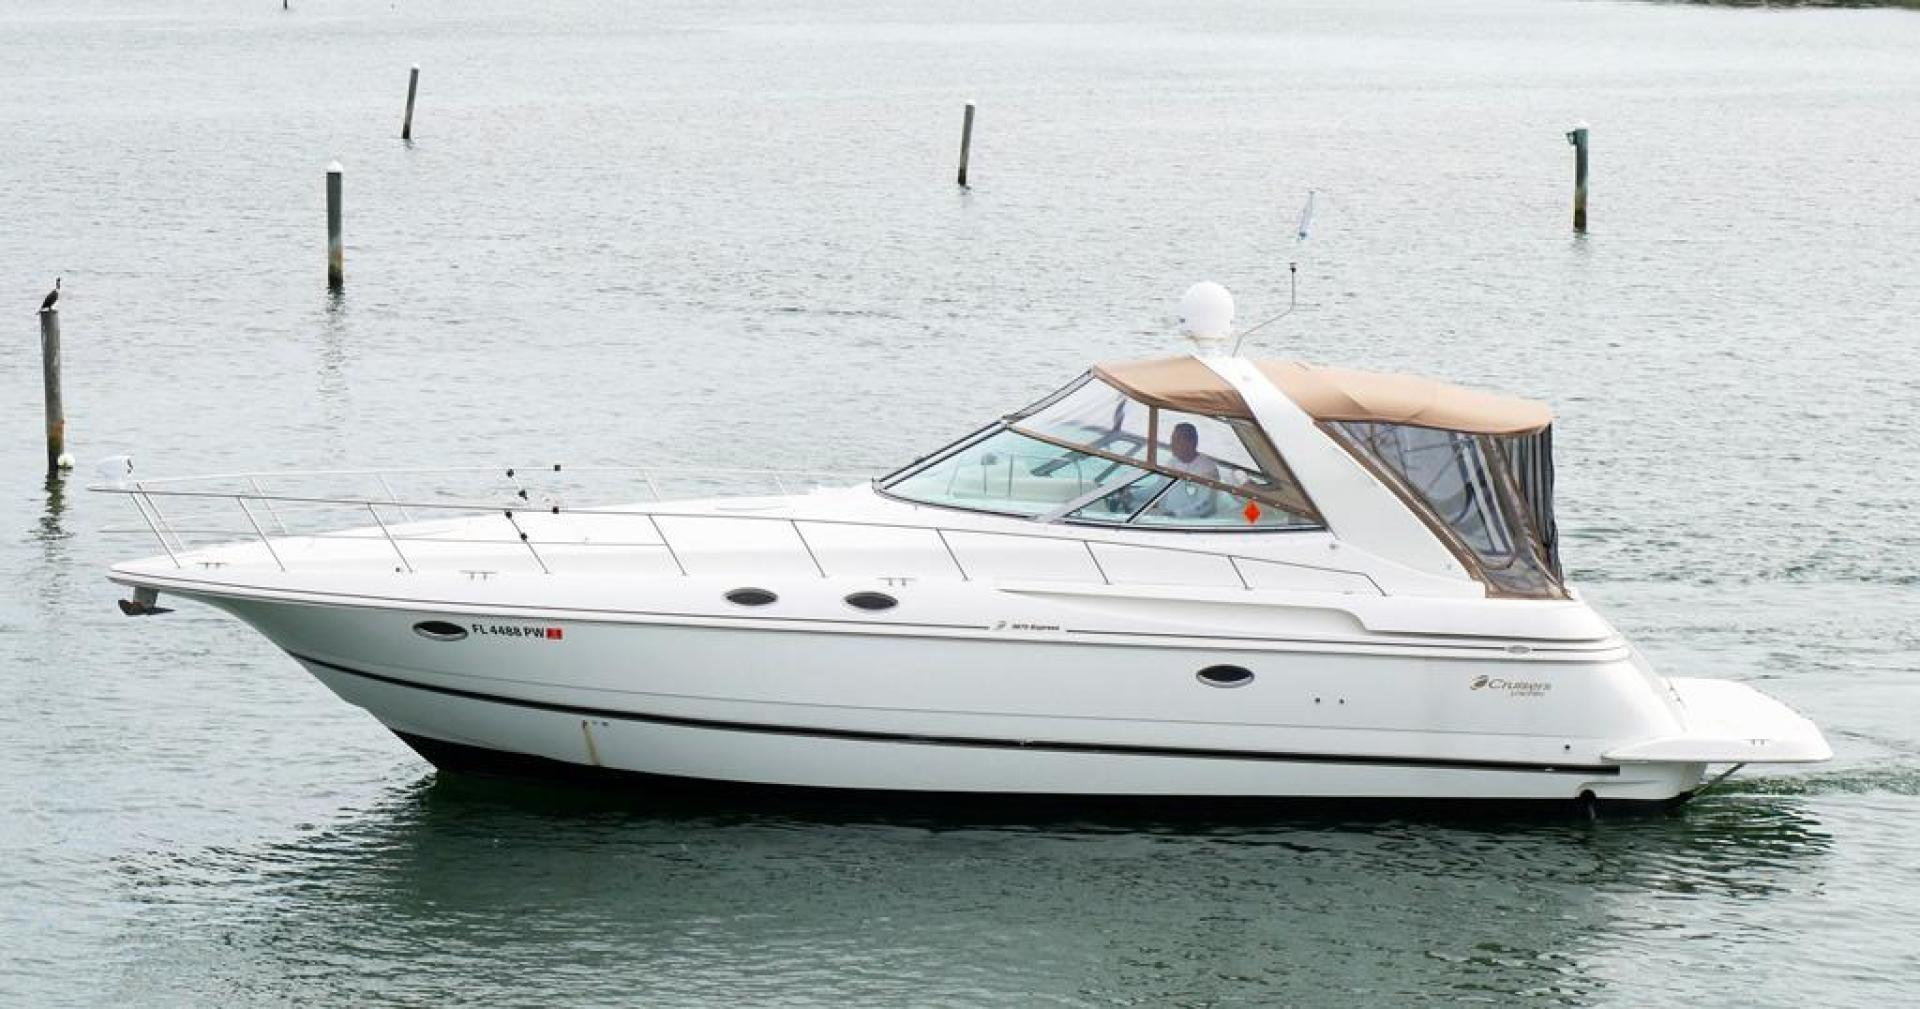 Cruisers-3870 Express 2000-CDreams Destin-Florida-United States-2000 38 Cruisers CDreams Port Profile-716056 | Thumbnail